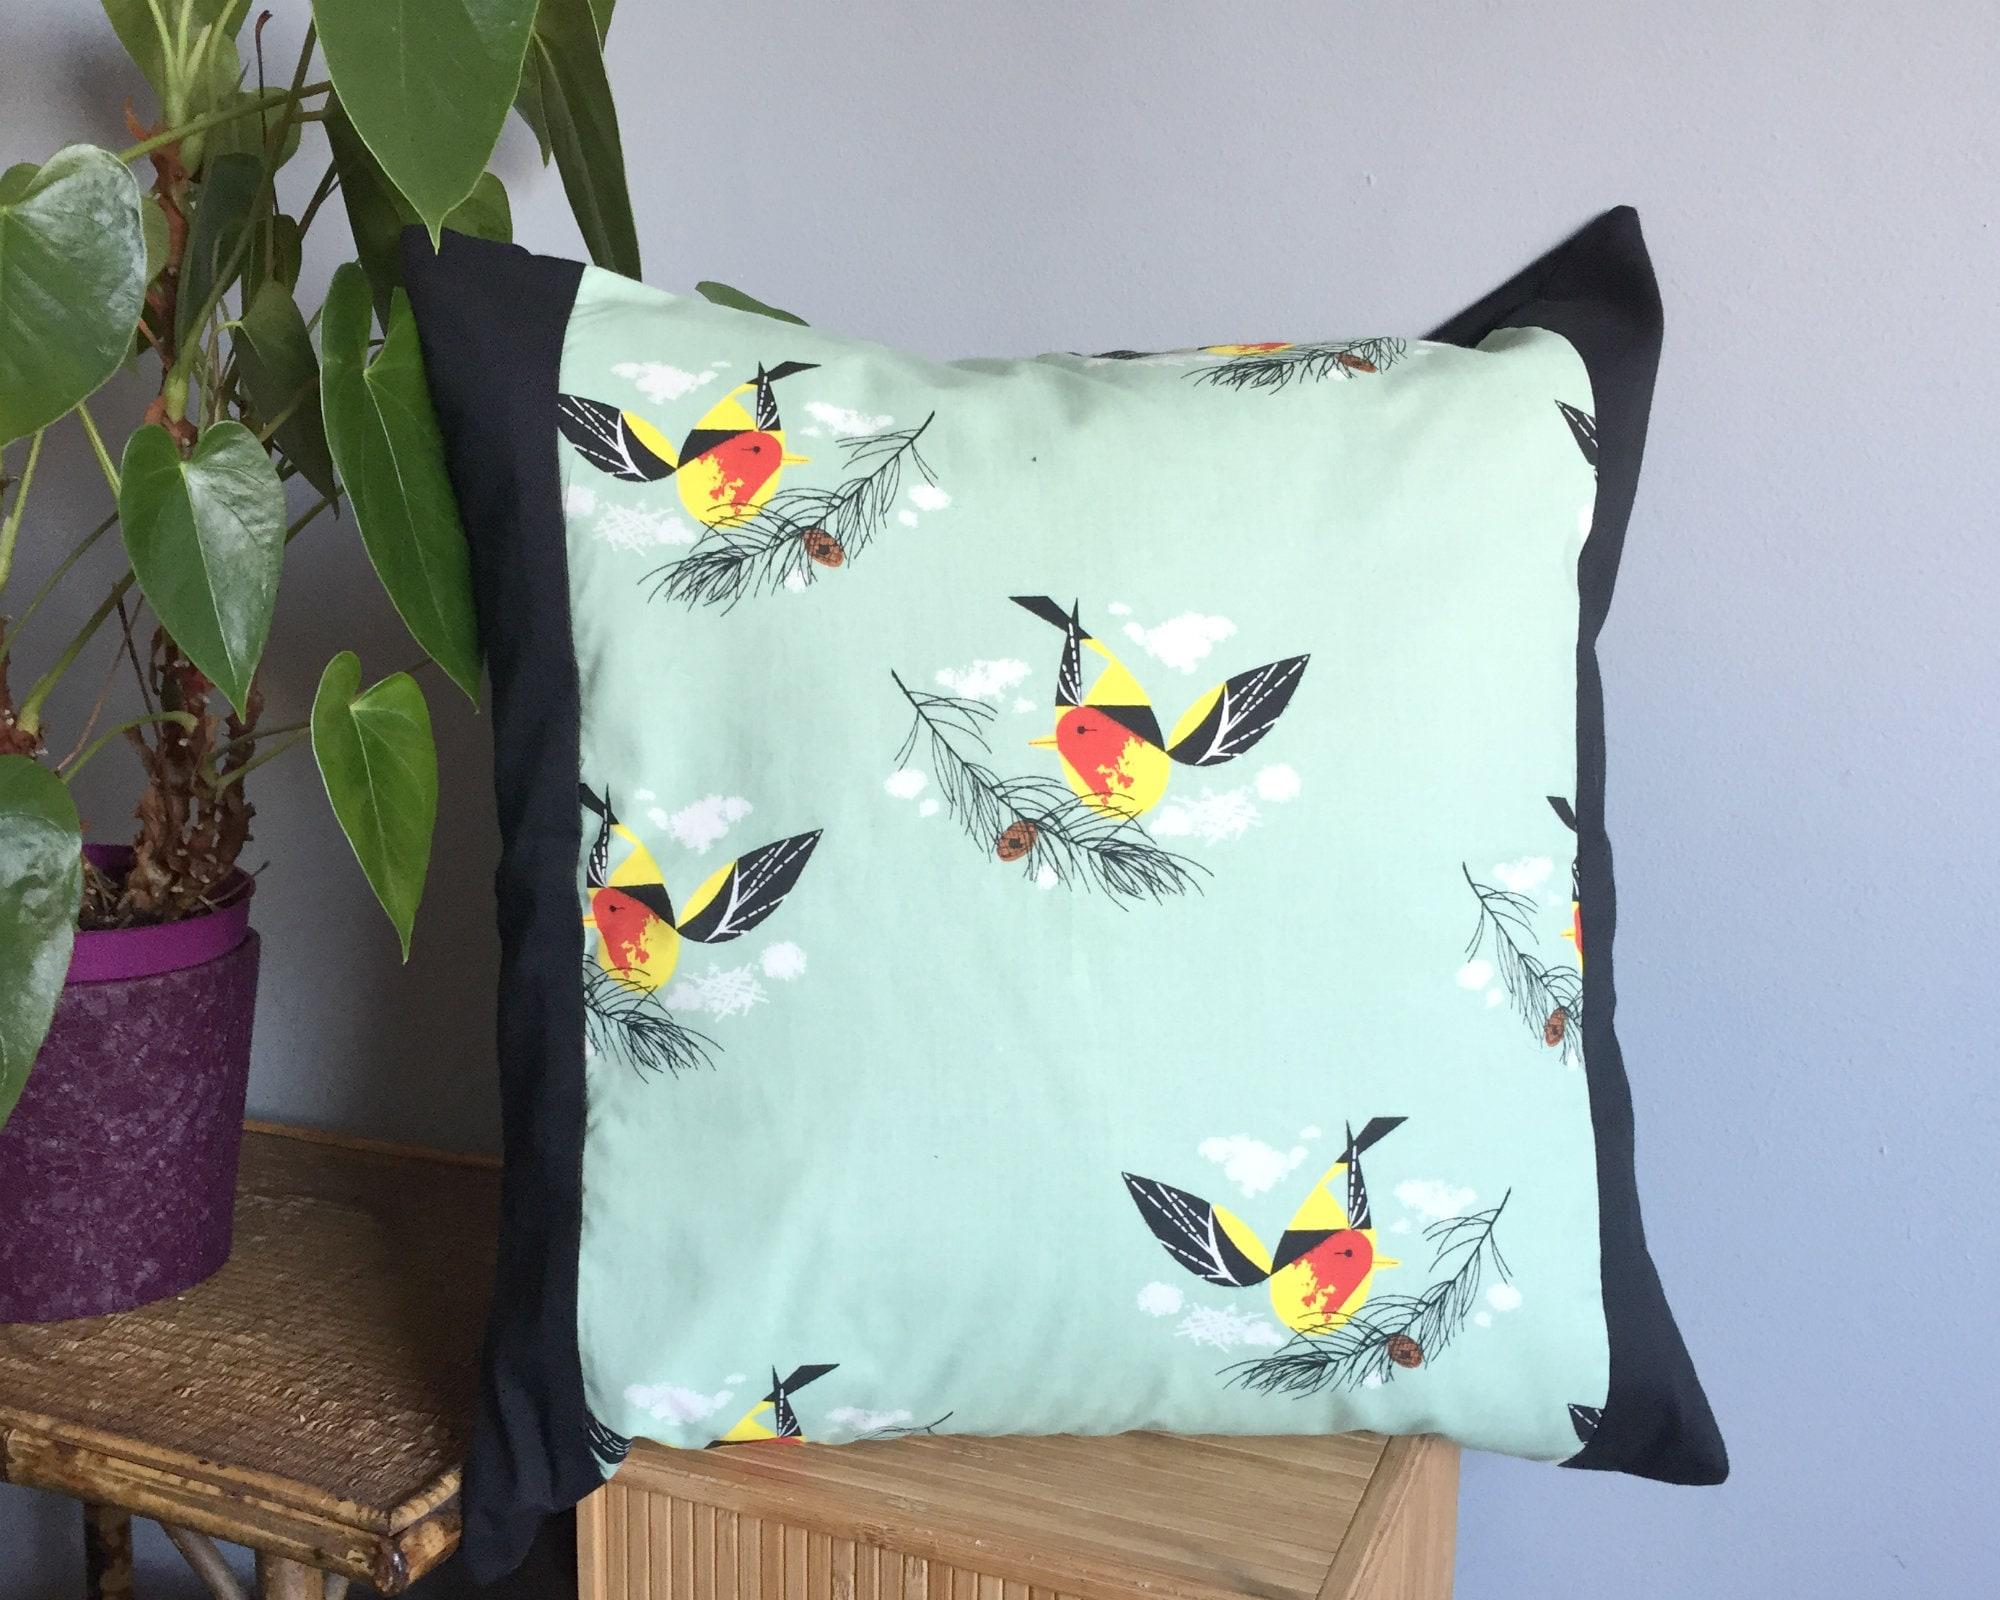 Mid Century Modern Pillow Charley Harper Design   Etsy